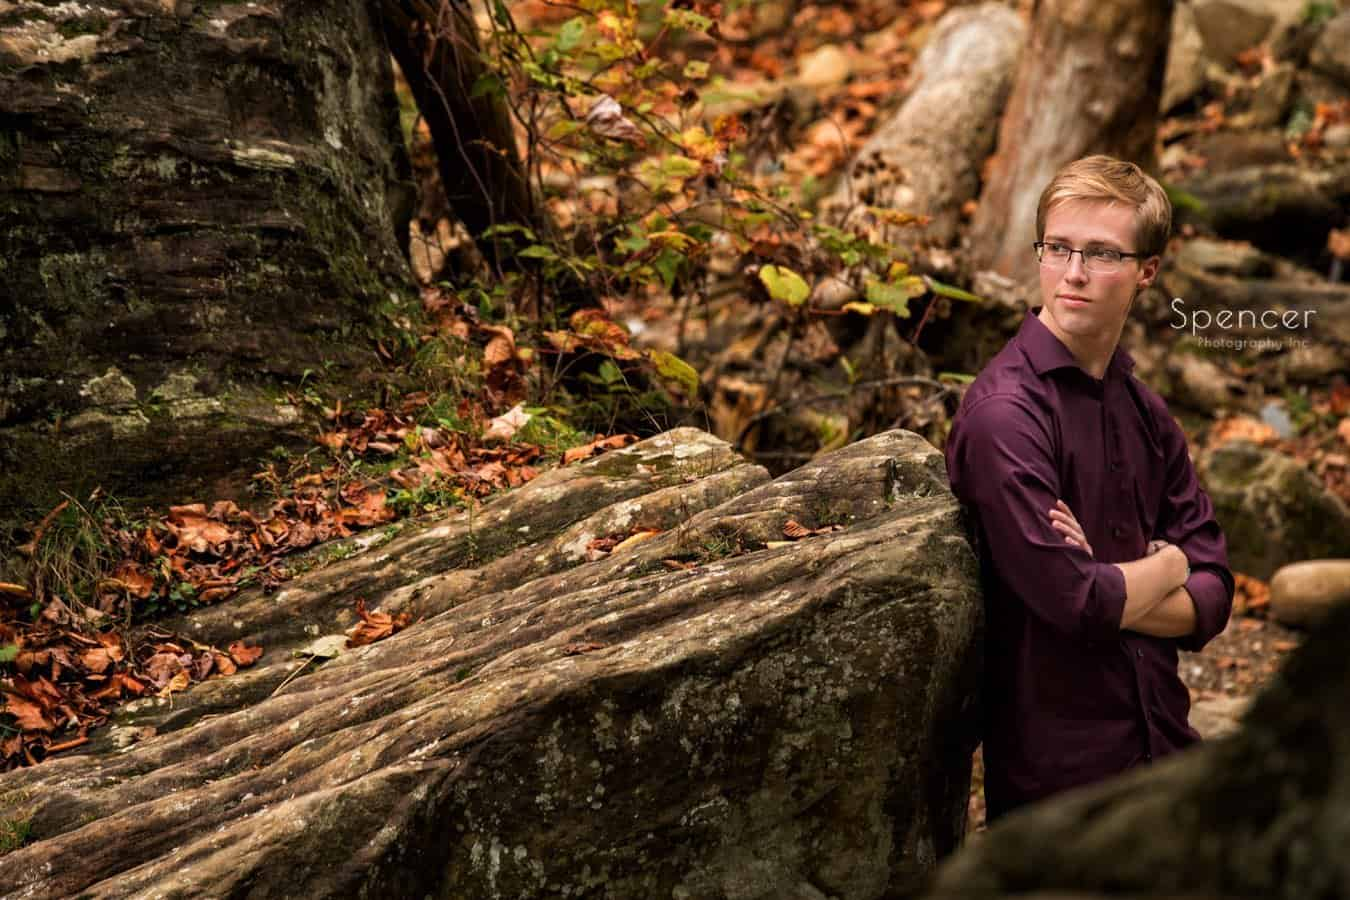 brecksville fall senior portrait with student standing cleveland park